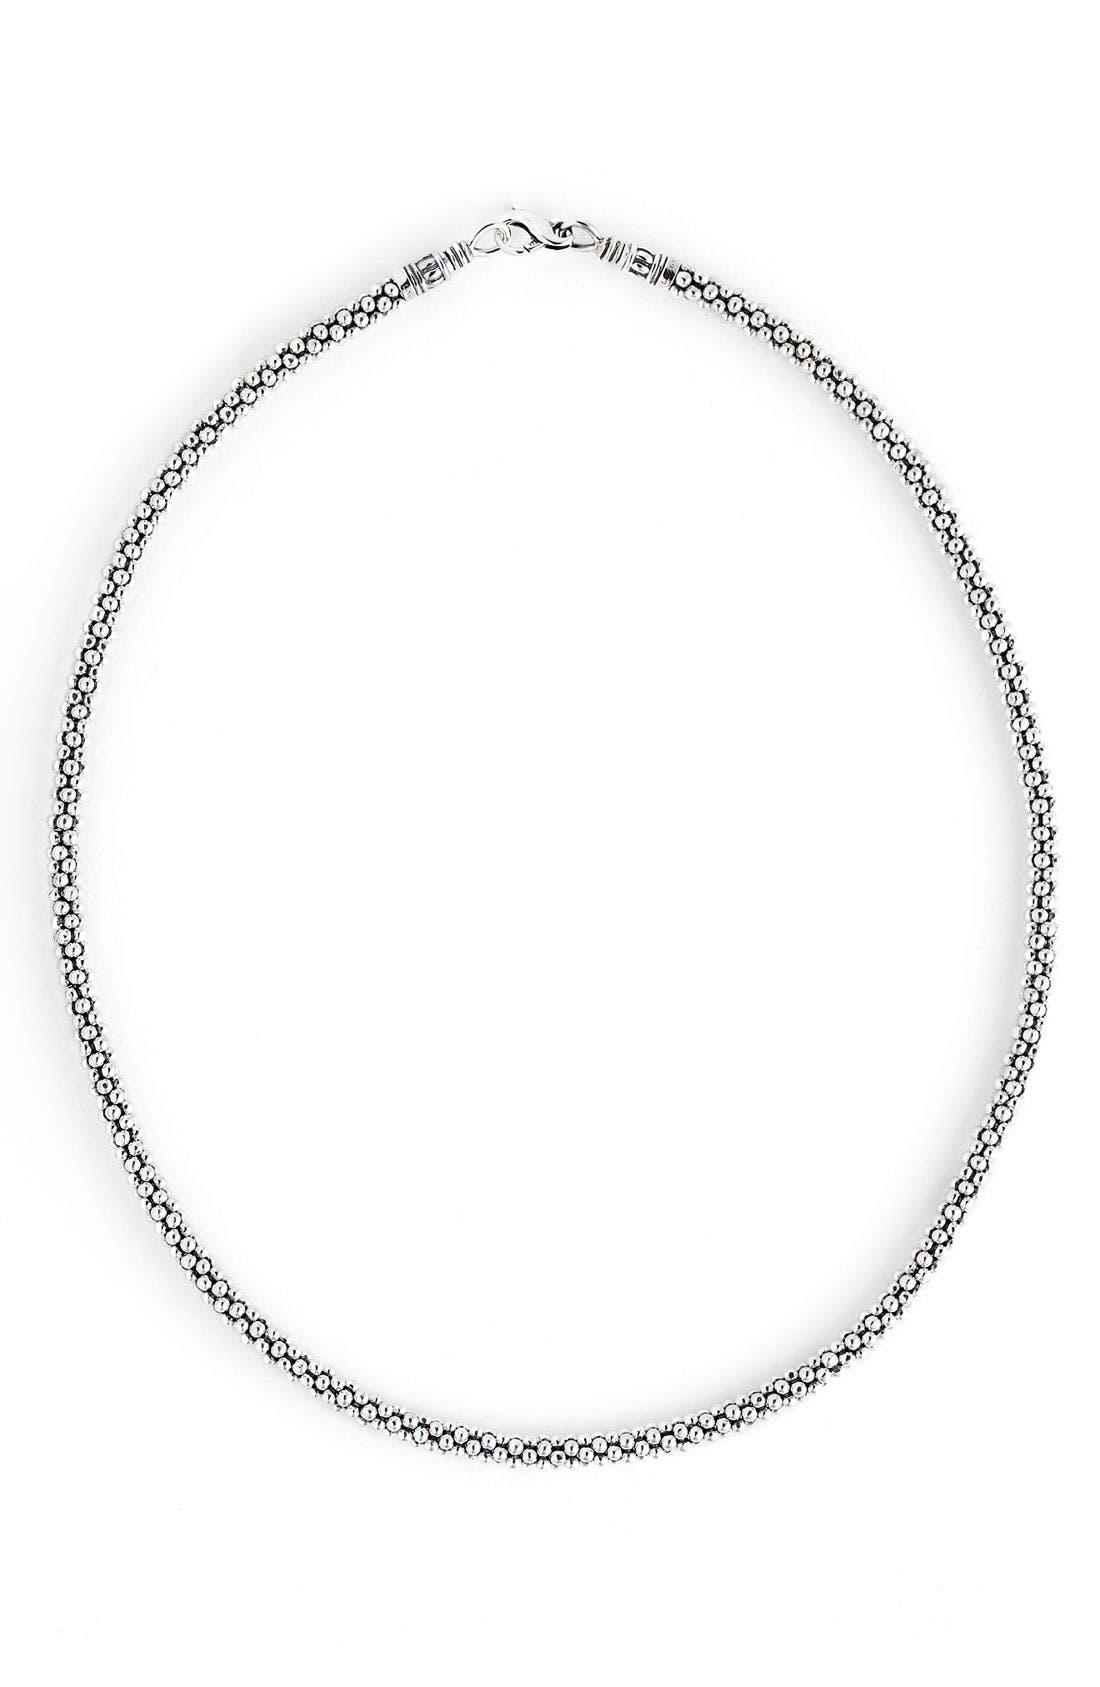 Main Image - LAGOS 'Signature' Rope Necklace